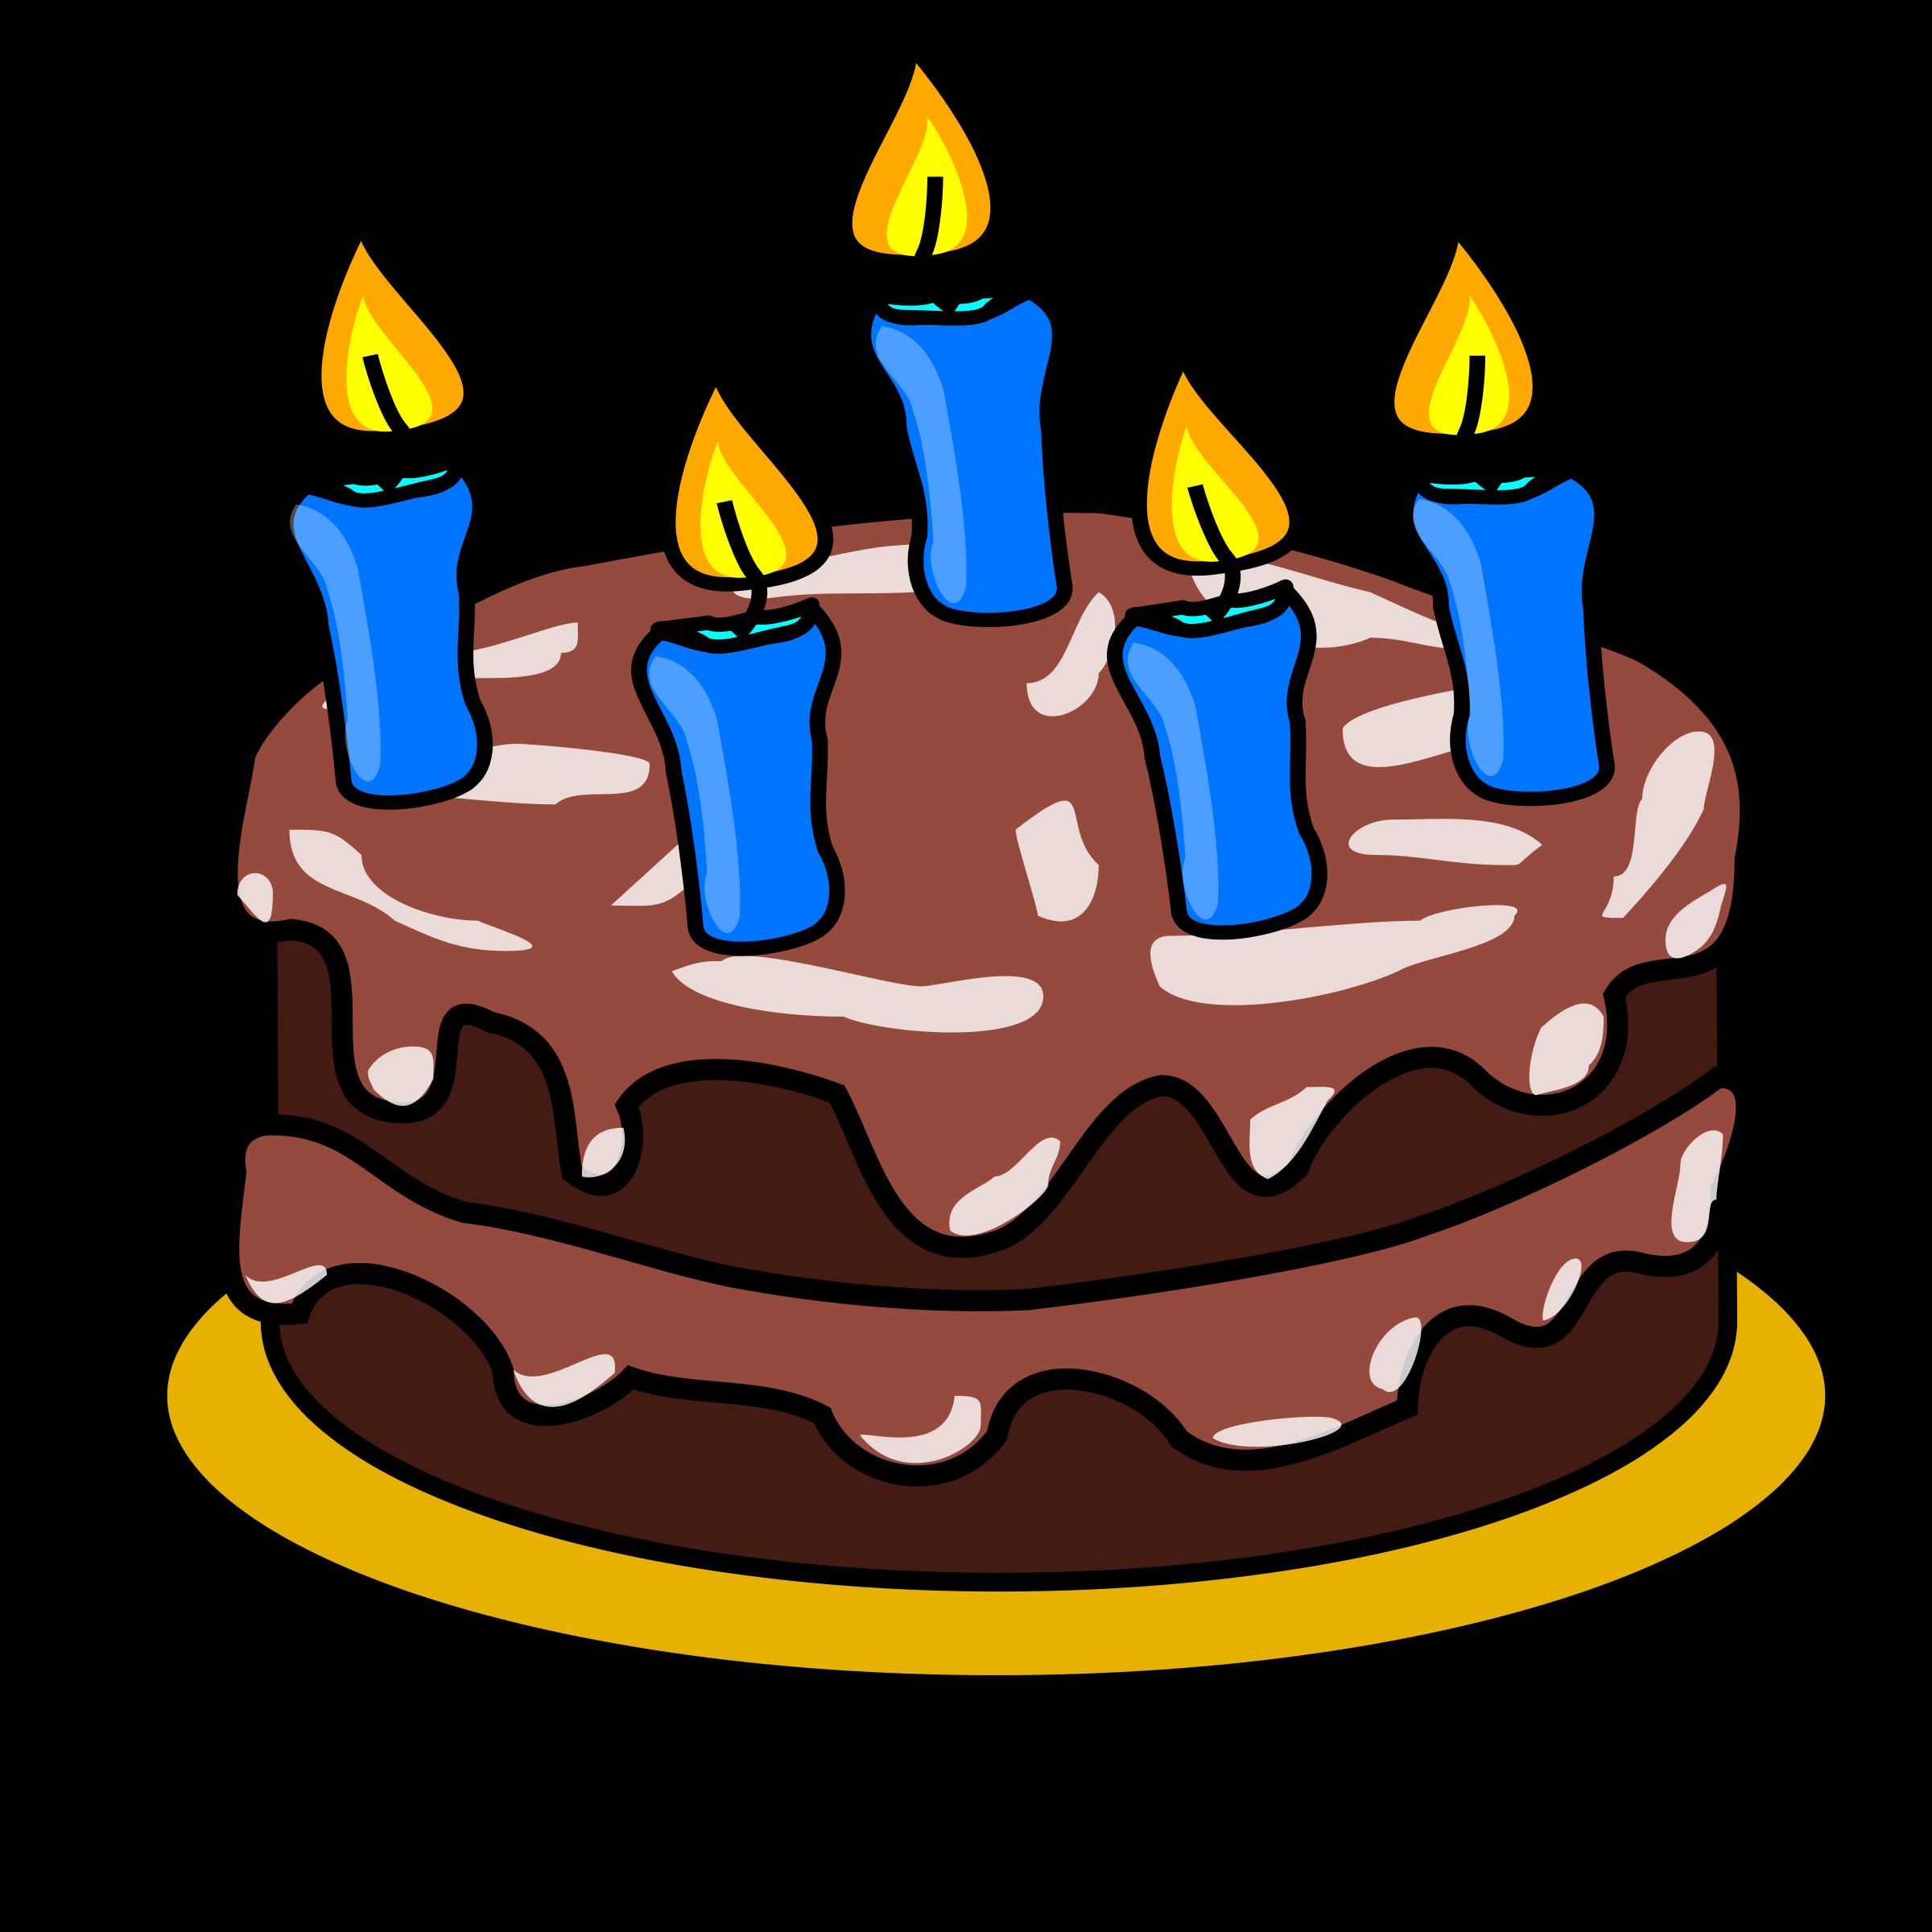 Cake Clip Art 1